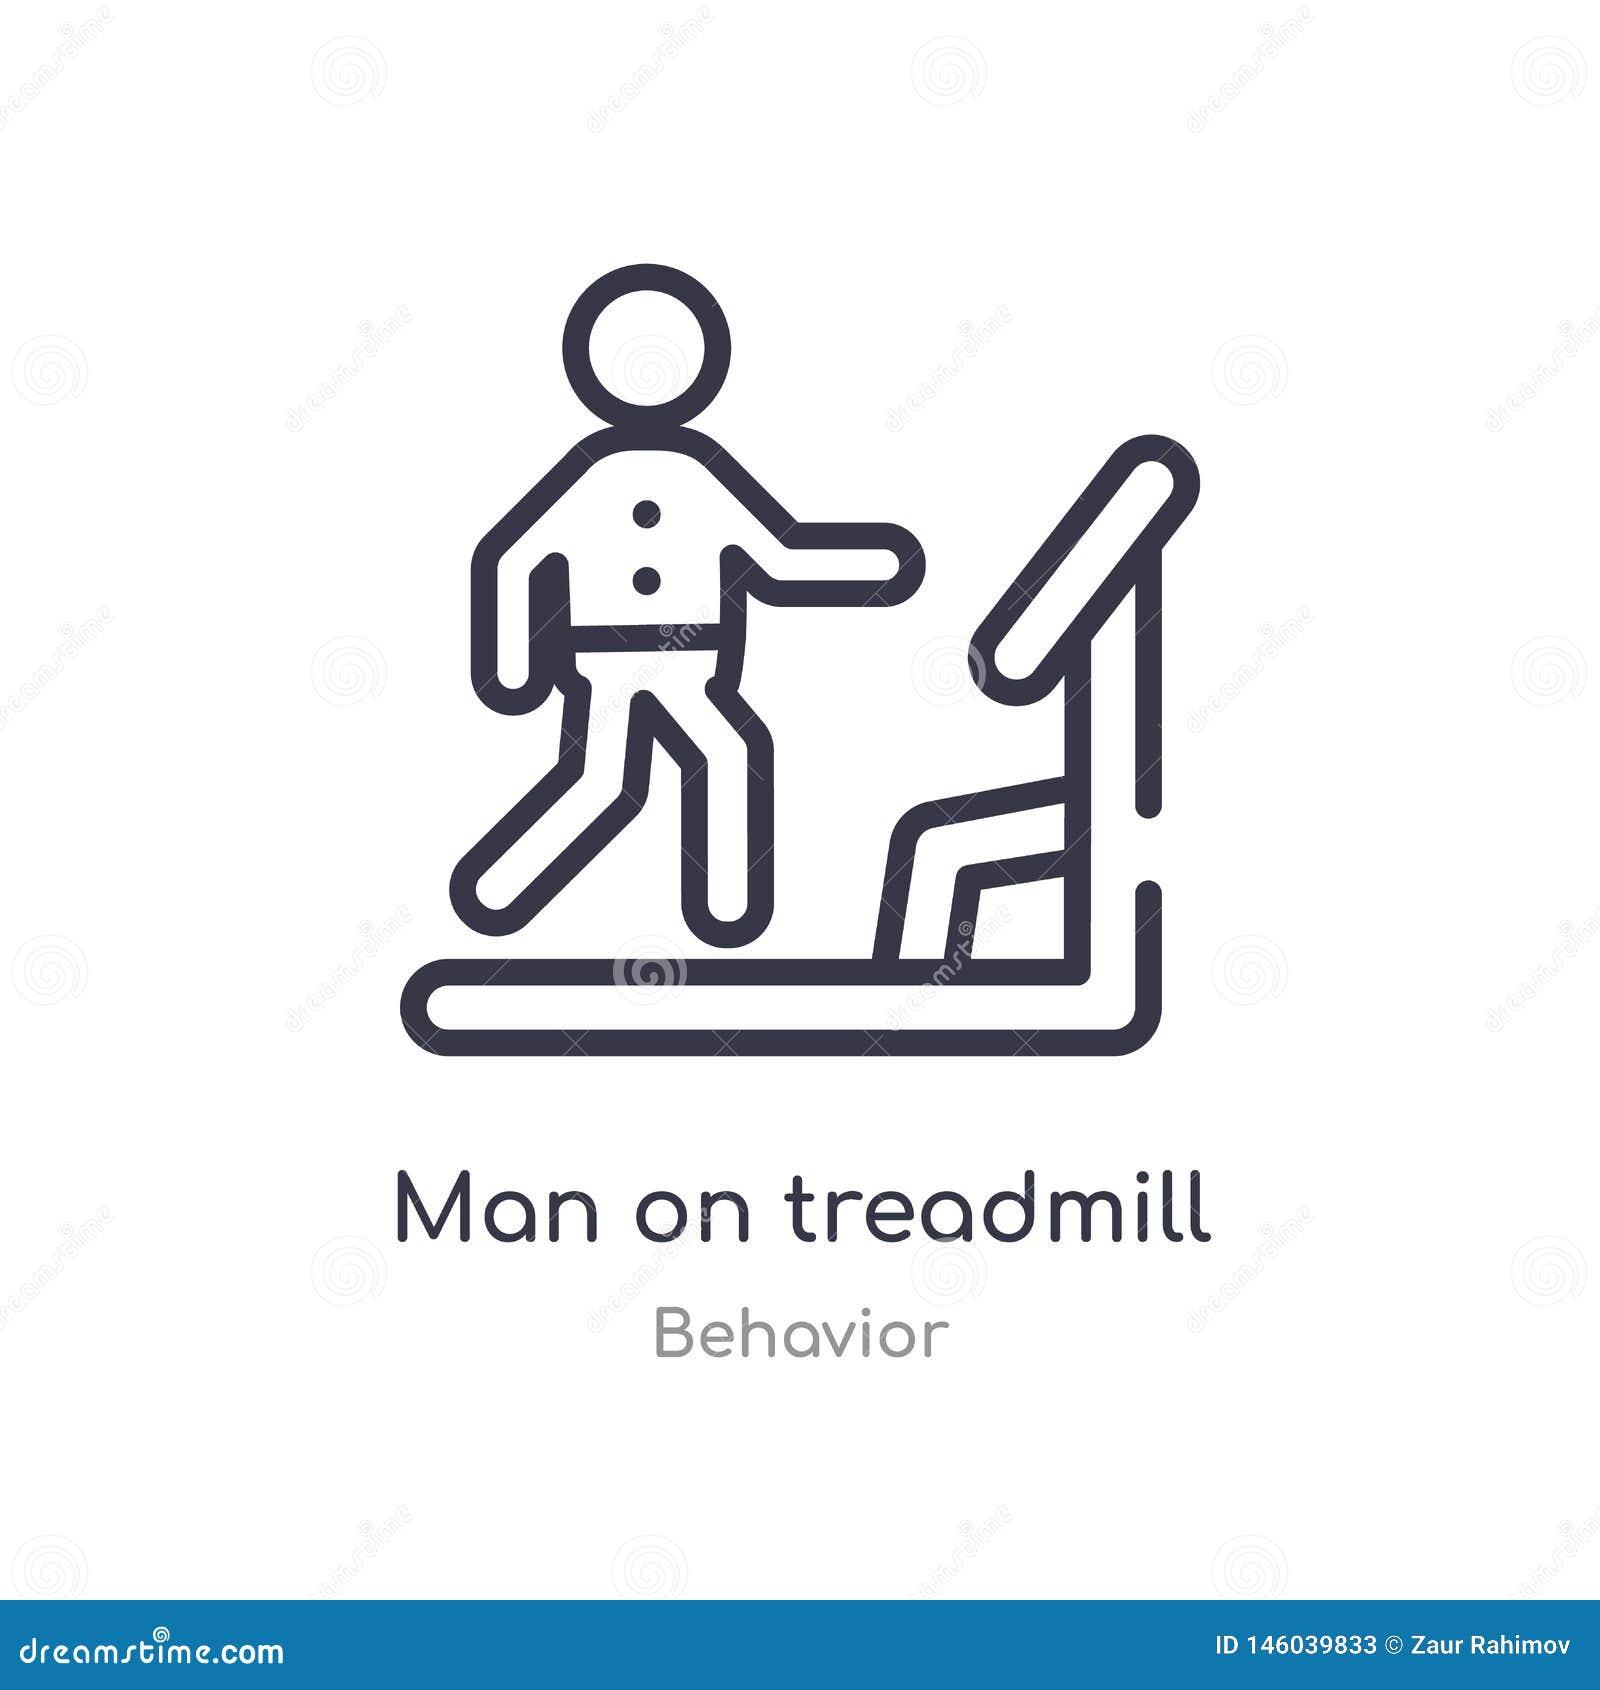 man on treadmill outline icon. isolated line vector illustration from behavior collection. editable thin stroke man on treadmill